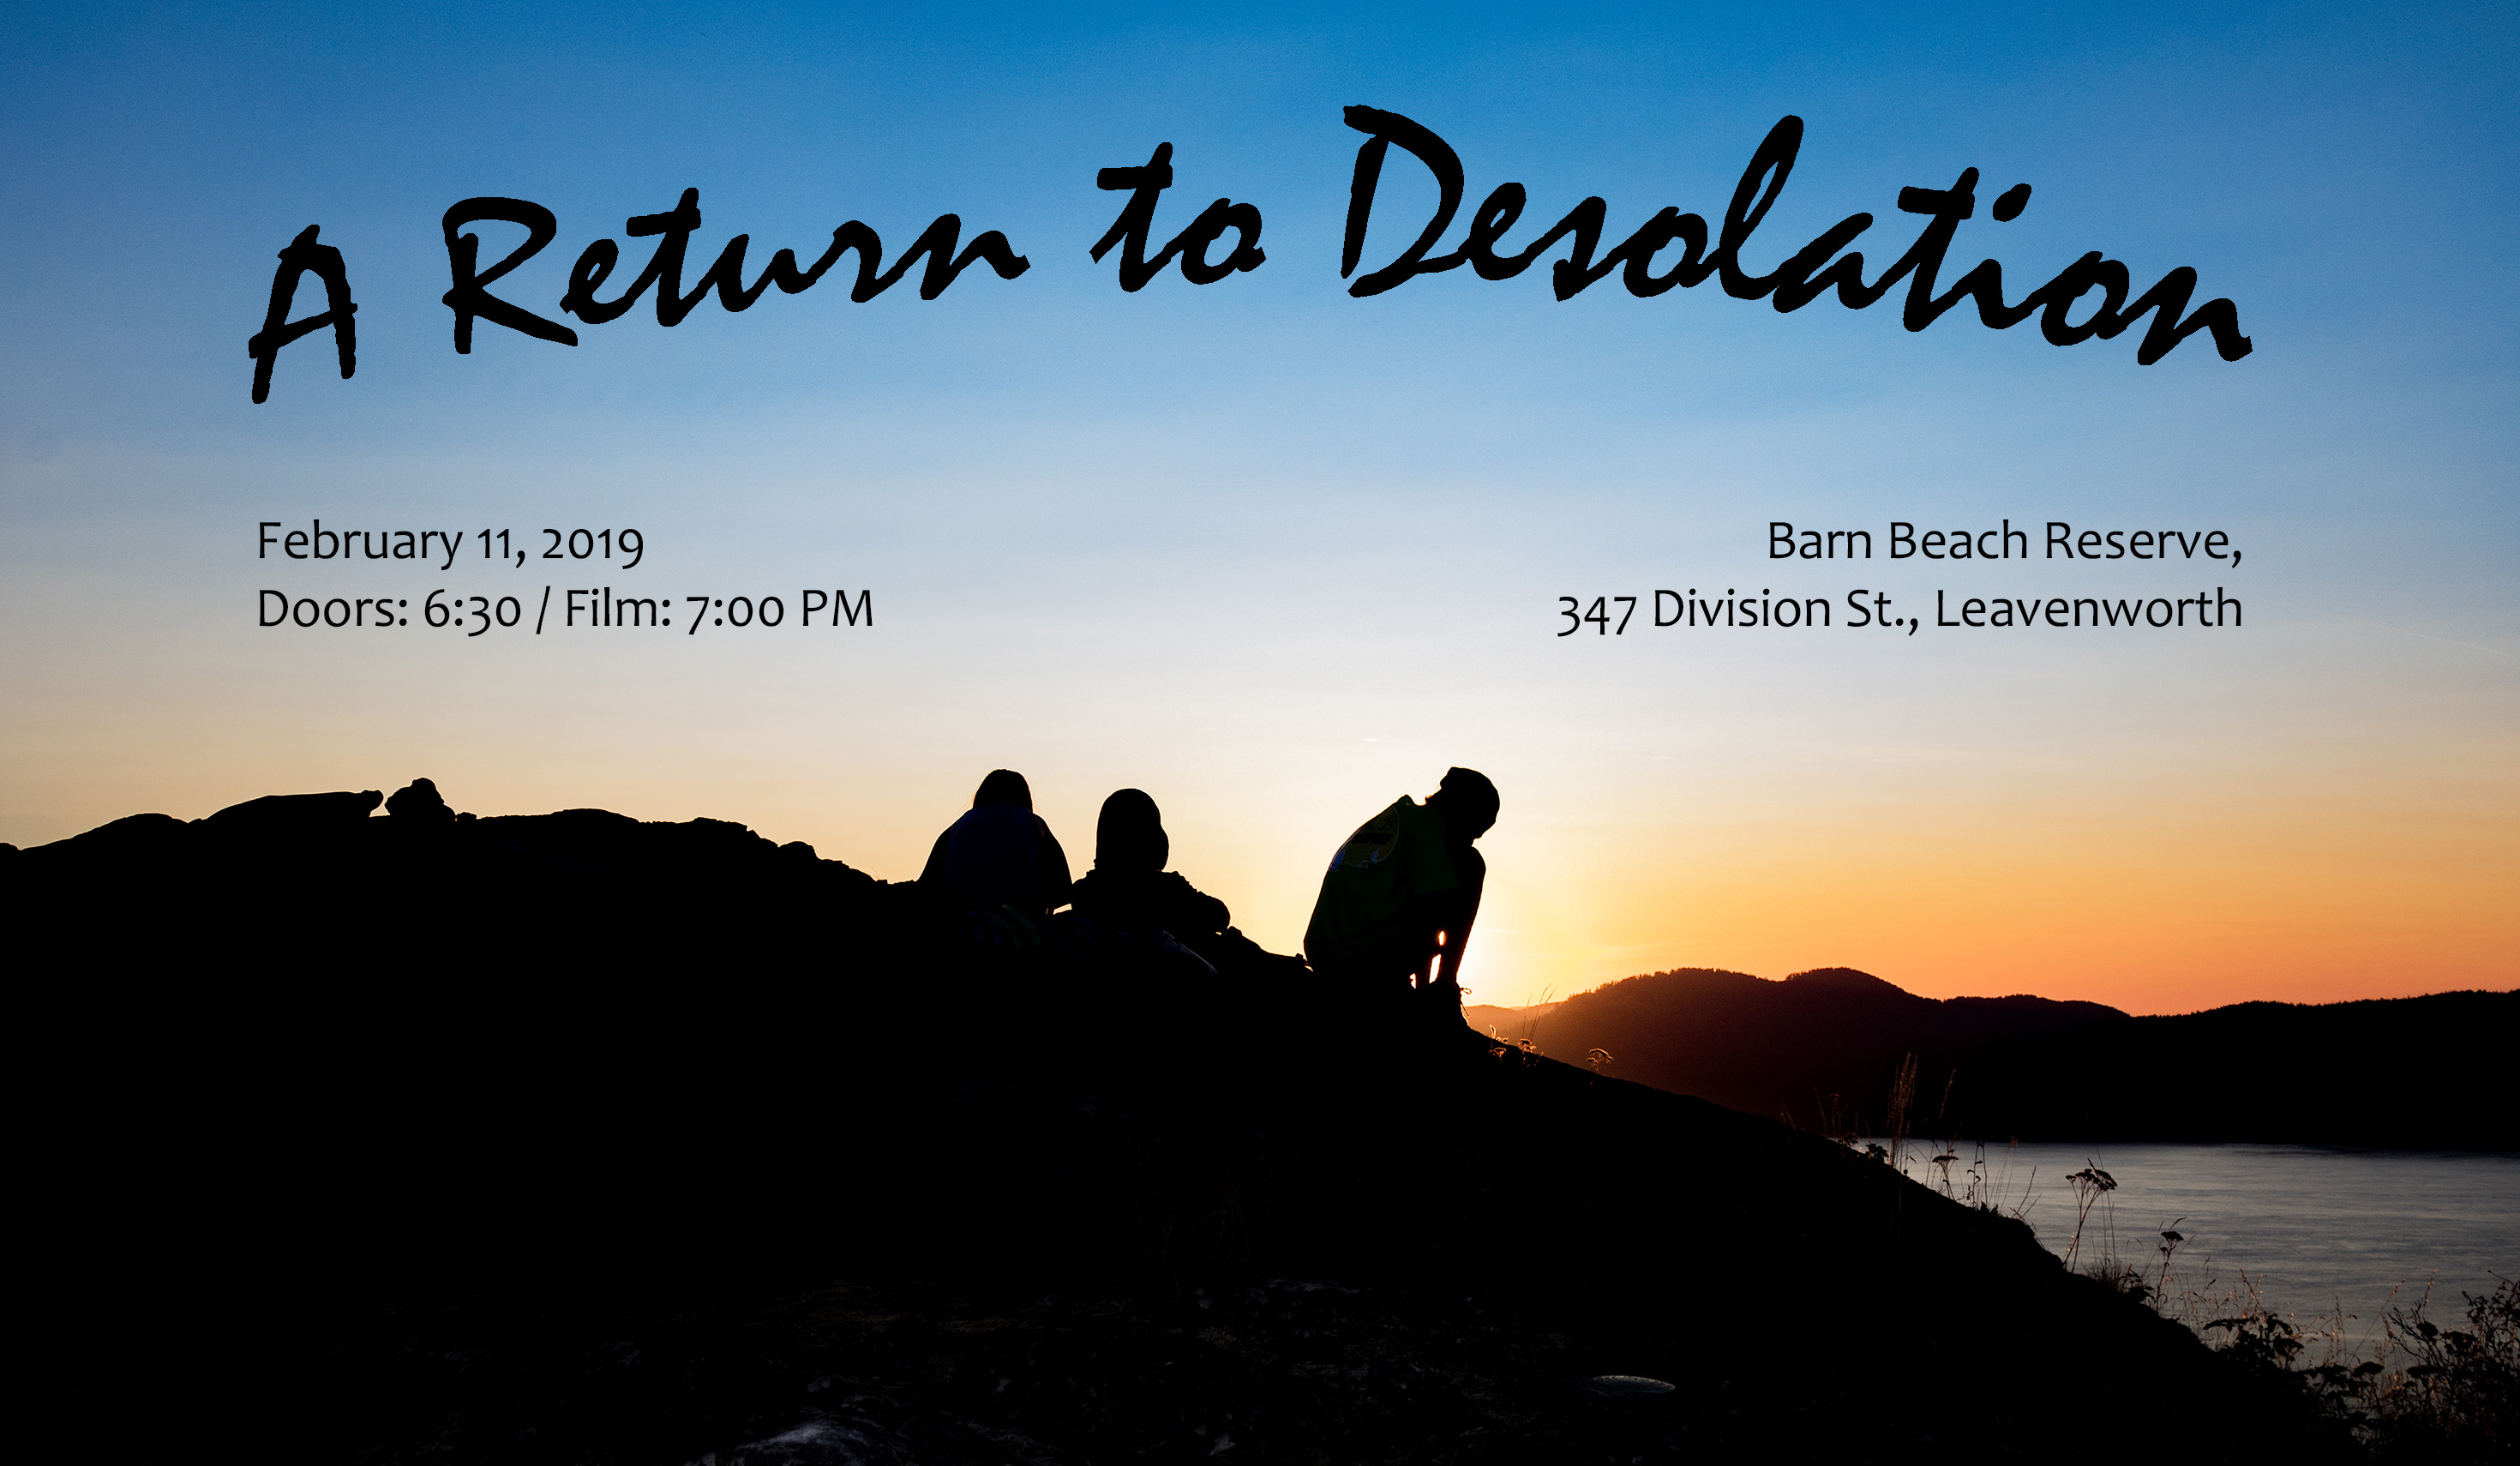 Film: A Return to Desolation, Farrell family sailing adventure aboard the beloved Enterprise